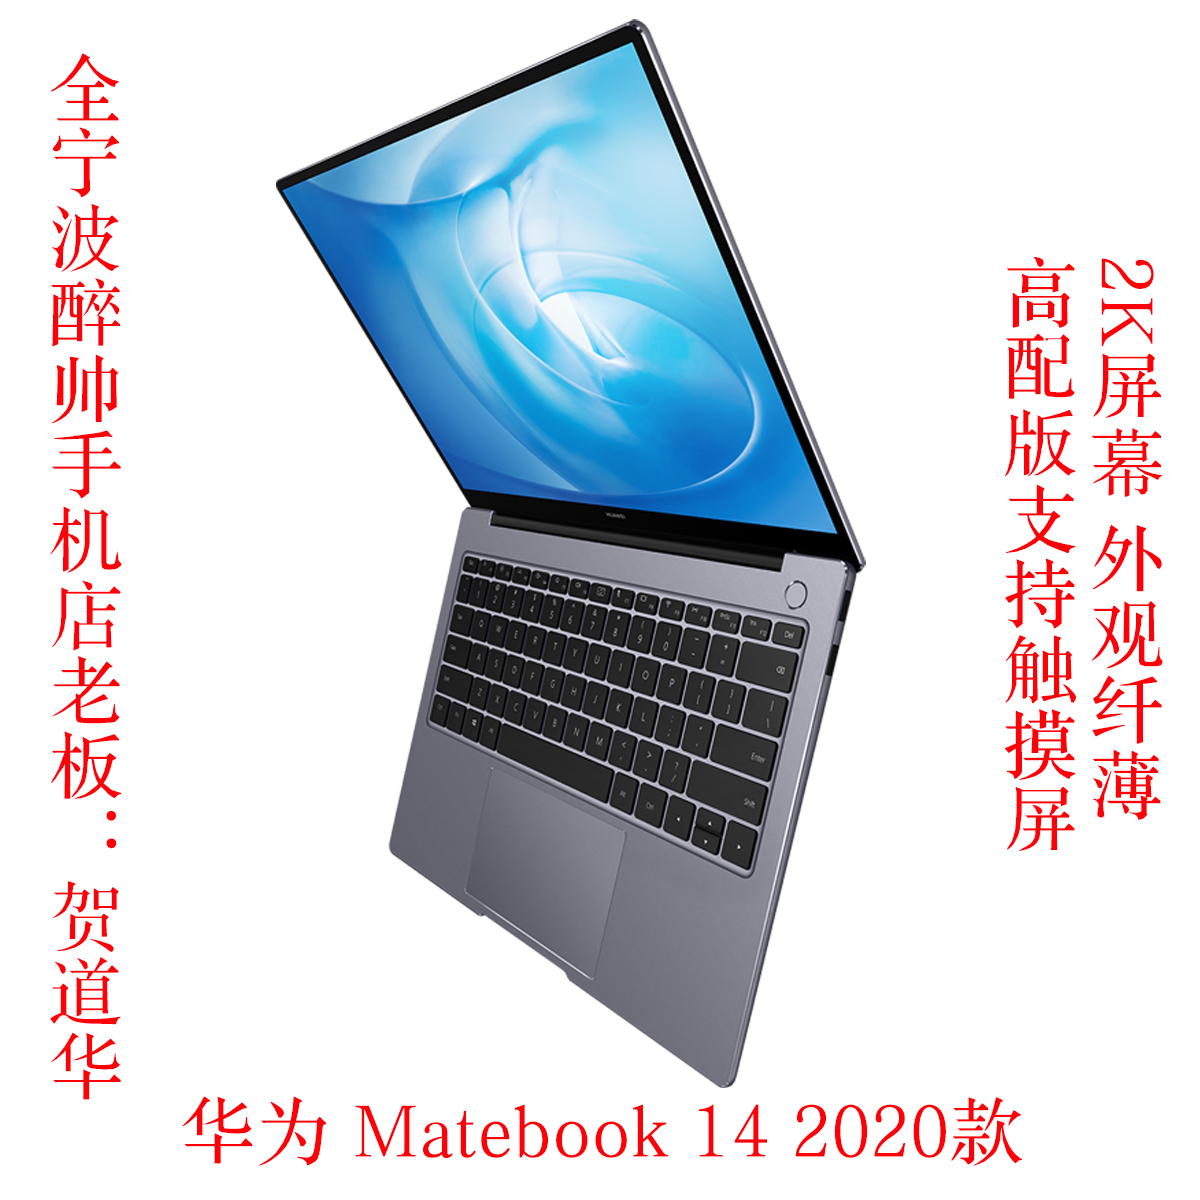 Huawei/华为 MateBook 14 KLVC-WAH9L 2020款 触摸屏 华为笔记本